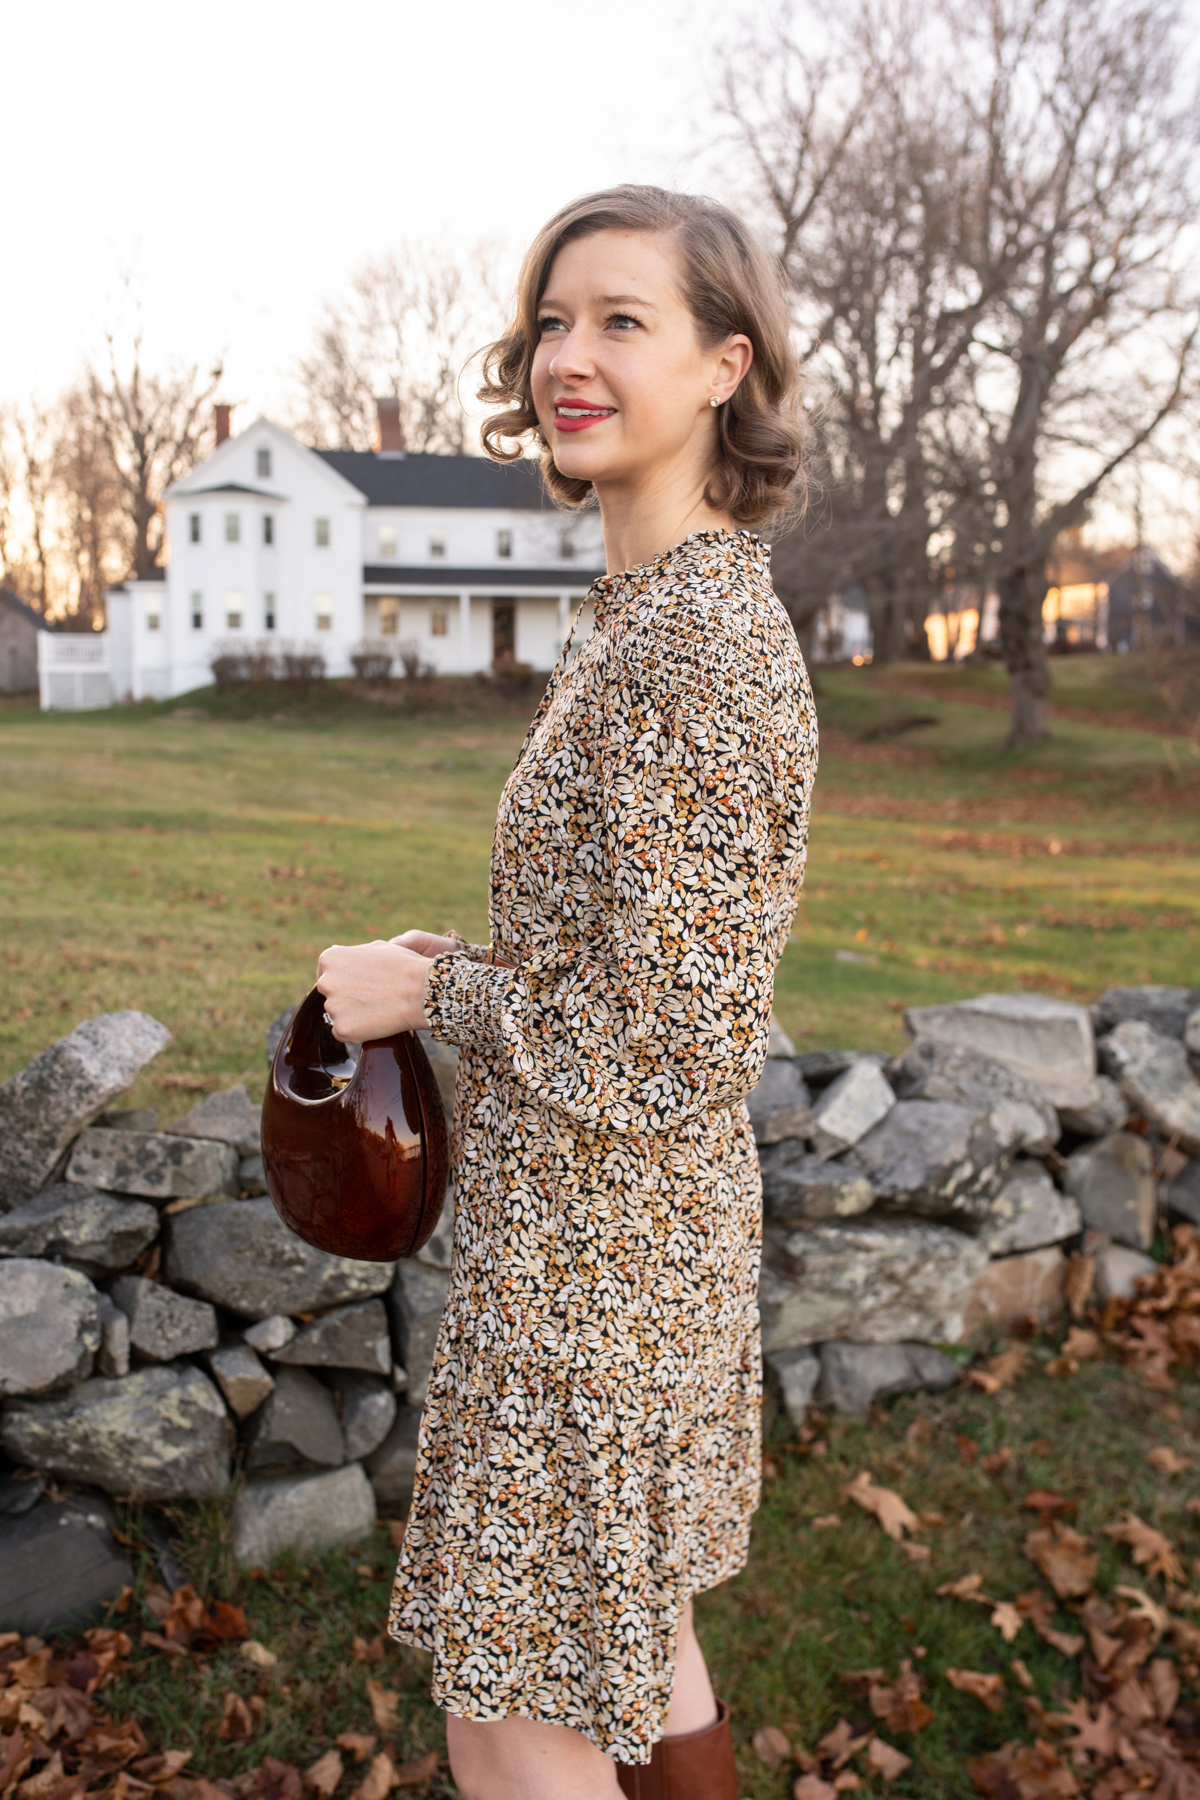 Stacie Flinner x Charlotte Brody Smocked Winterberry Dress-8.jpg